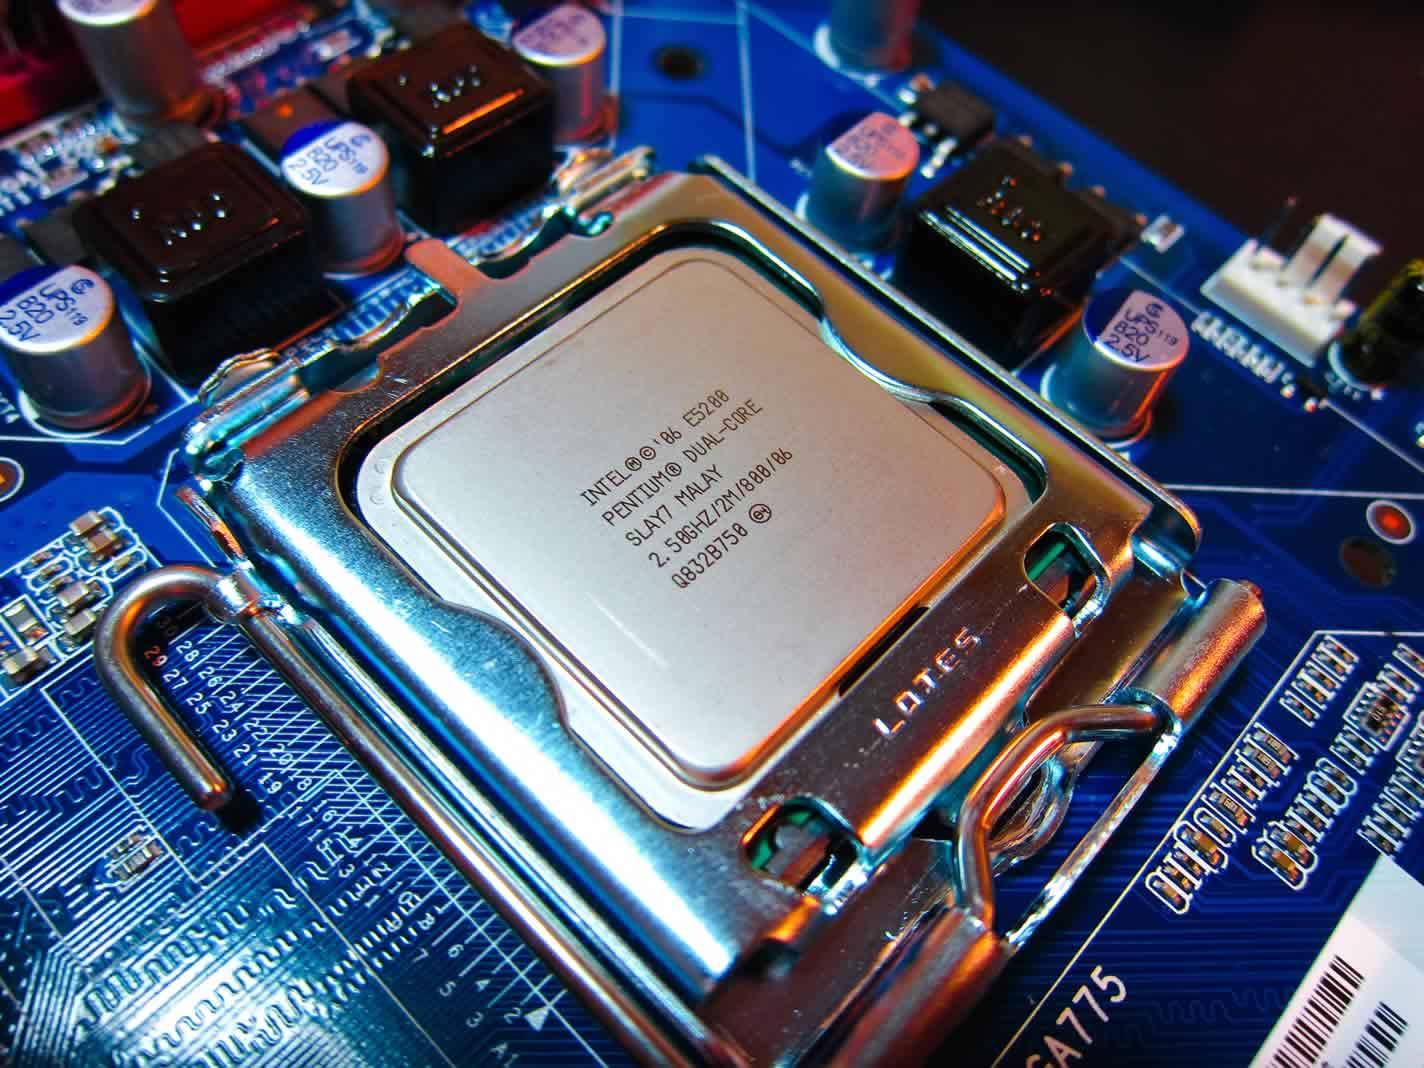 Procesadores intel lga 775 socket procesadores compatibles